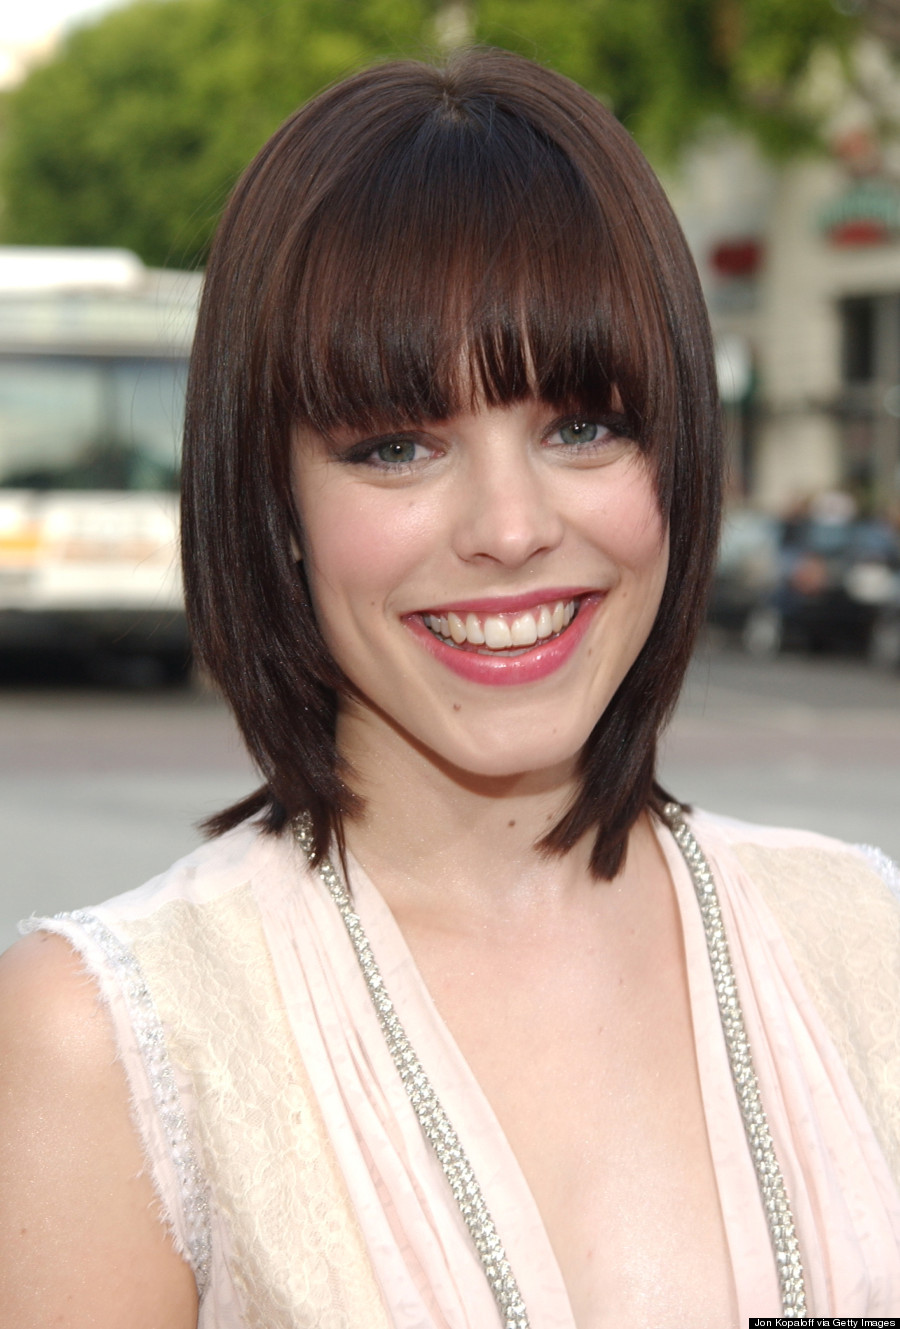 Rachel mcadams hair about time